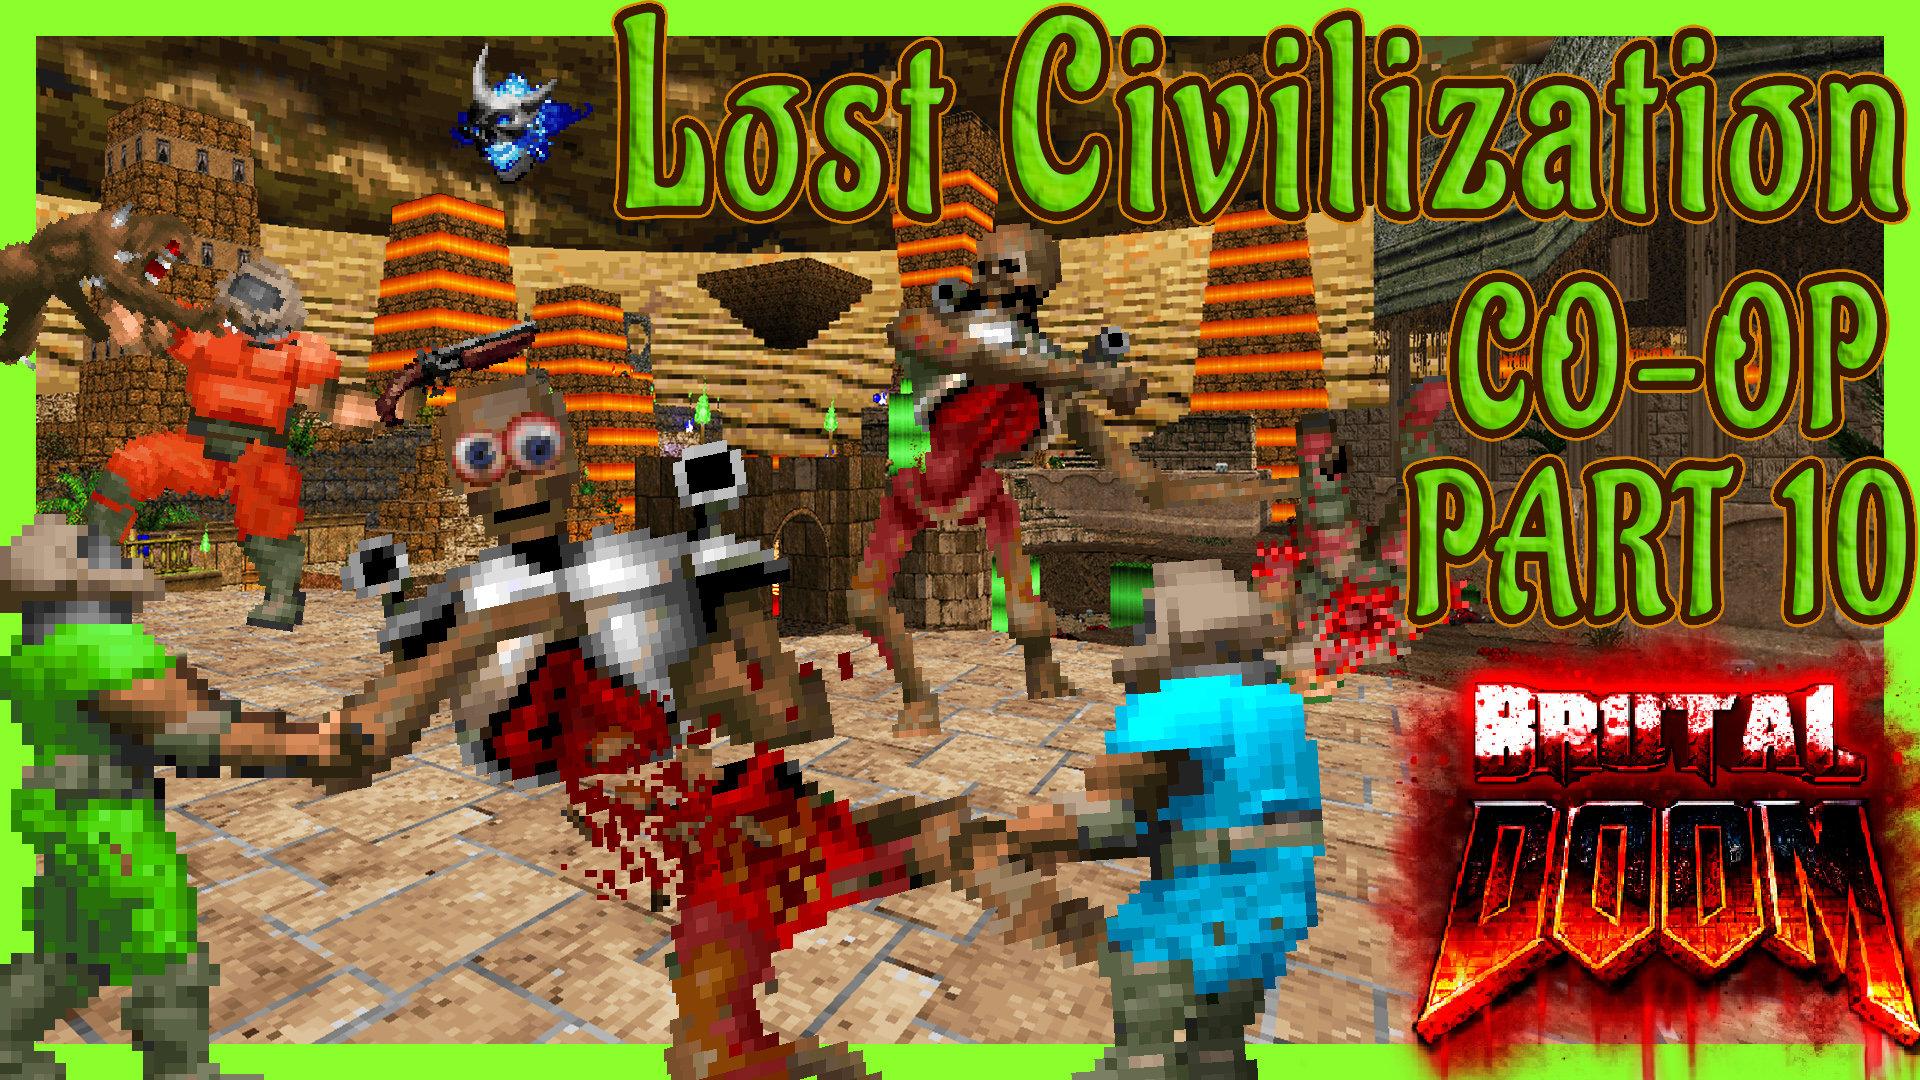 Lost Civilization (BD) part10.jpg